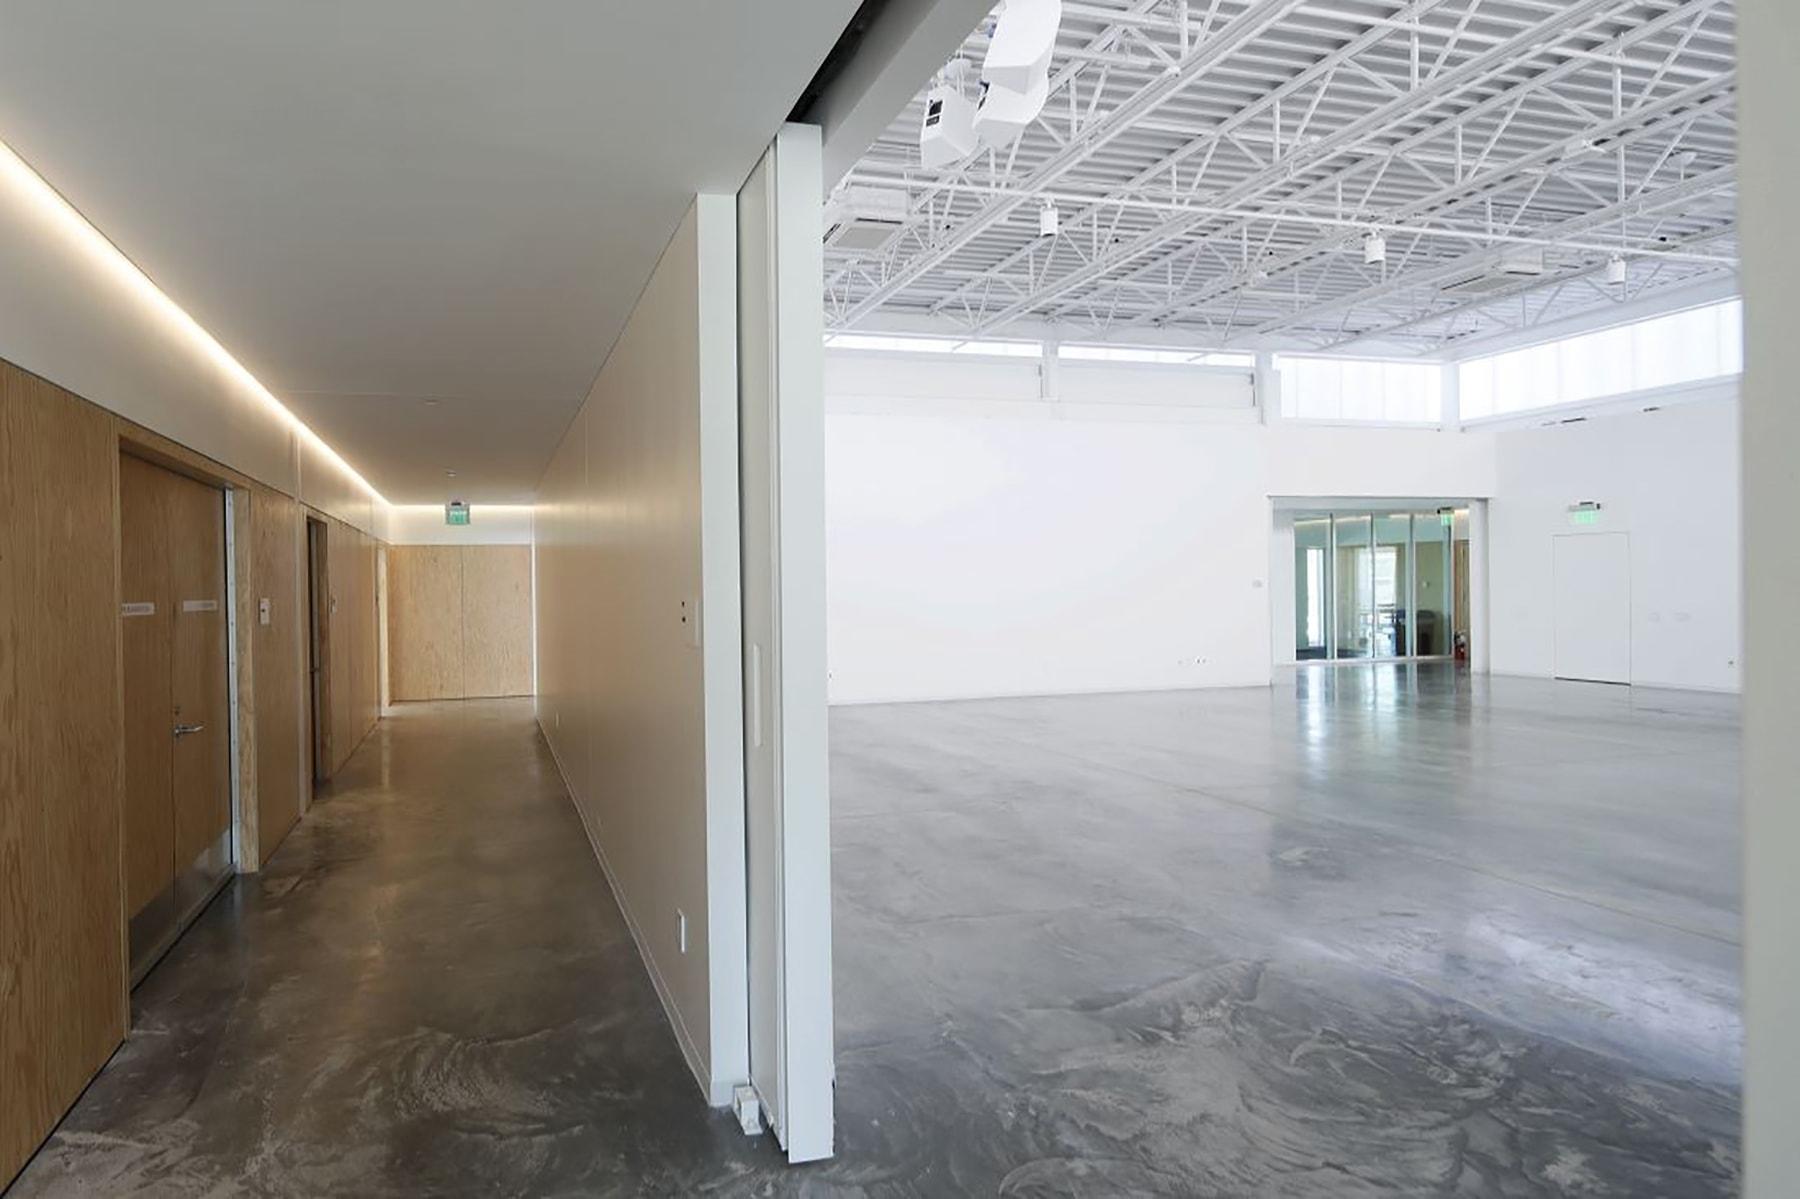 12_ArtLab_Barkow-Lebinger-Architects